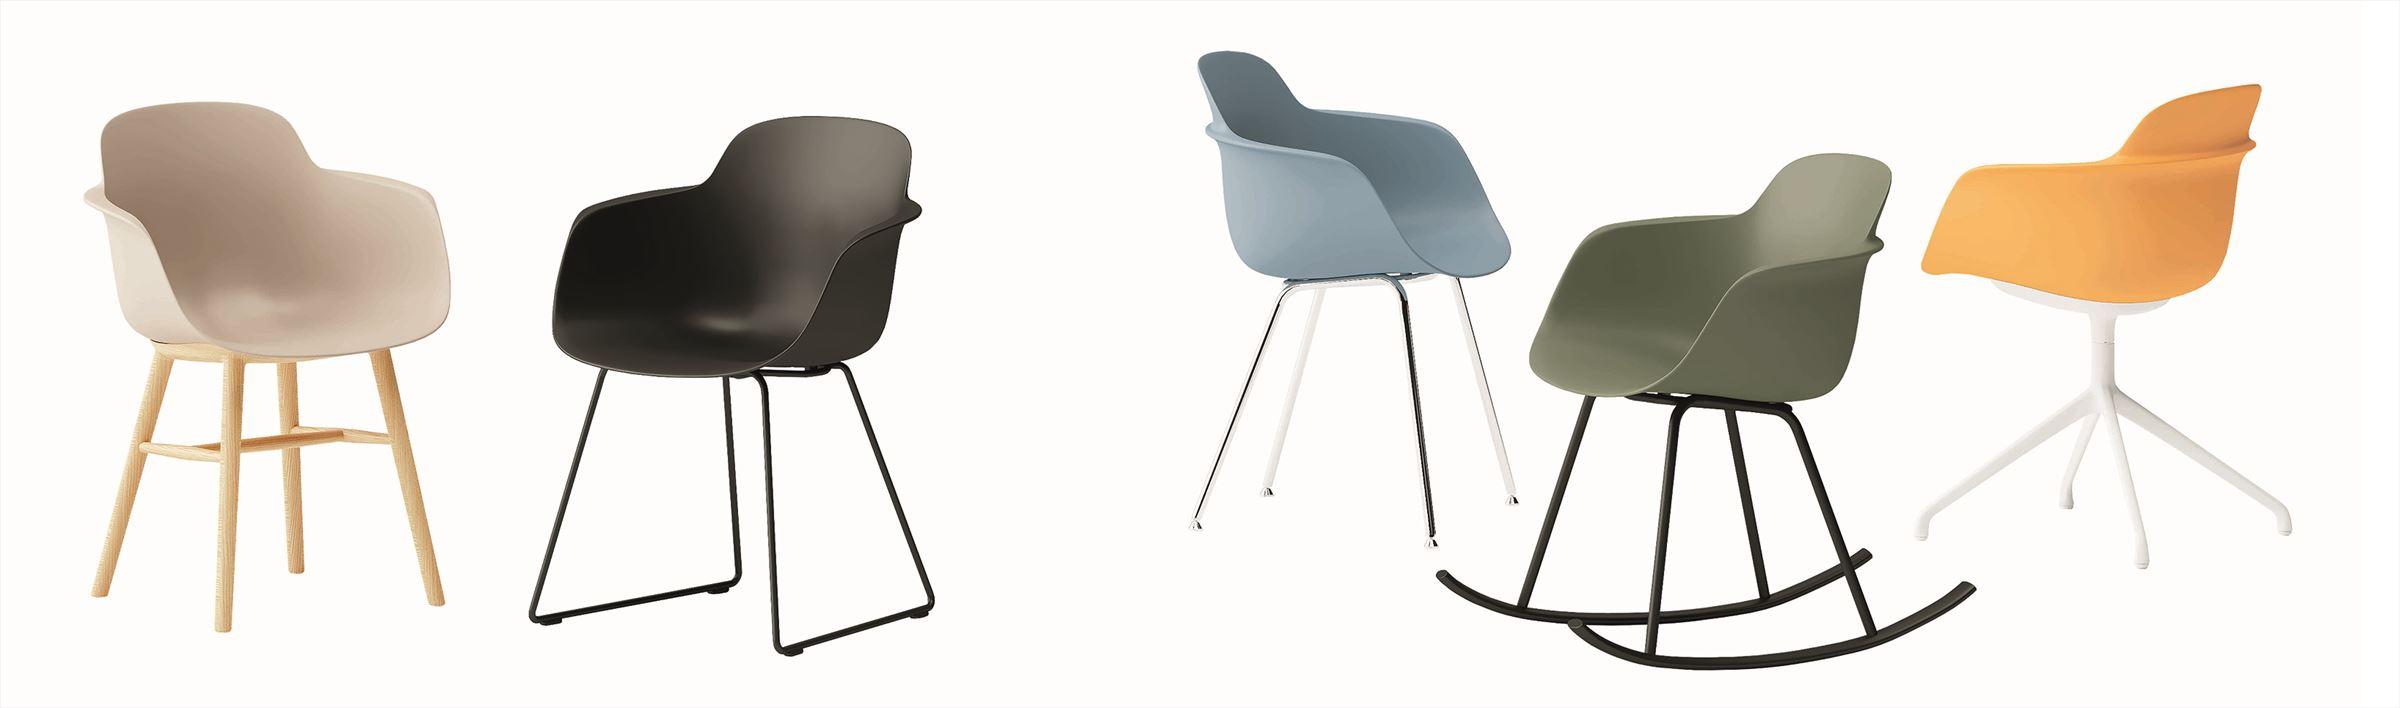 Plastic Design Stoelen.Chairs